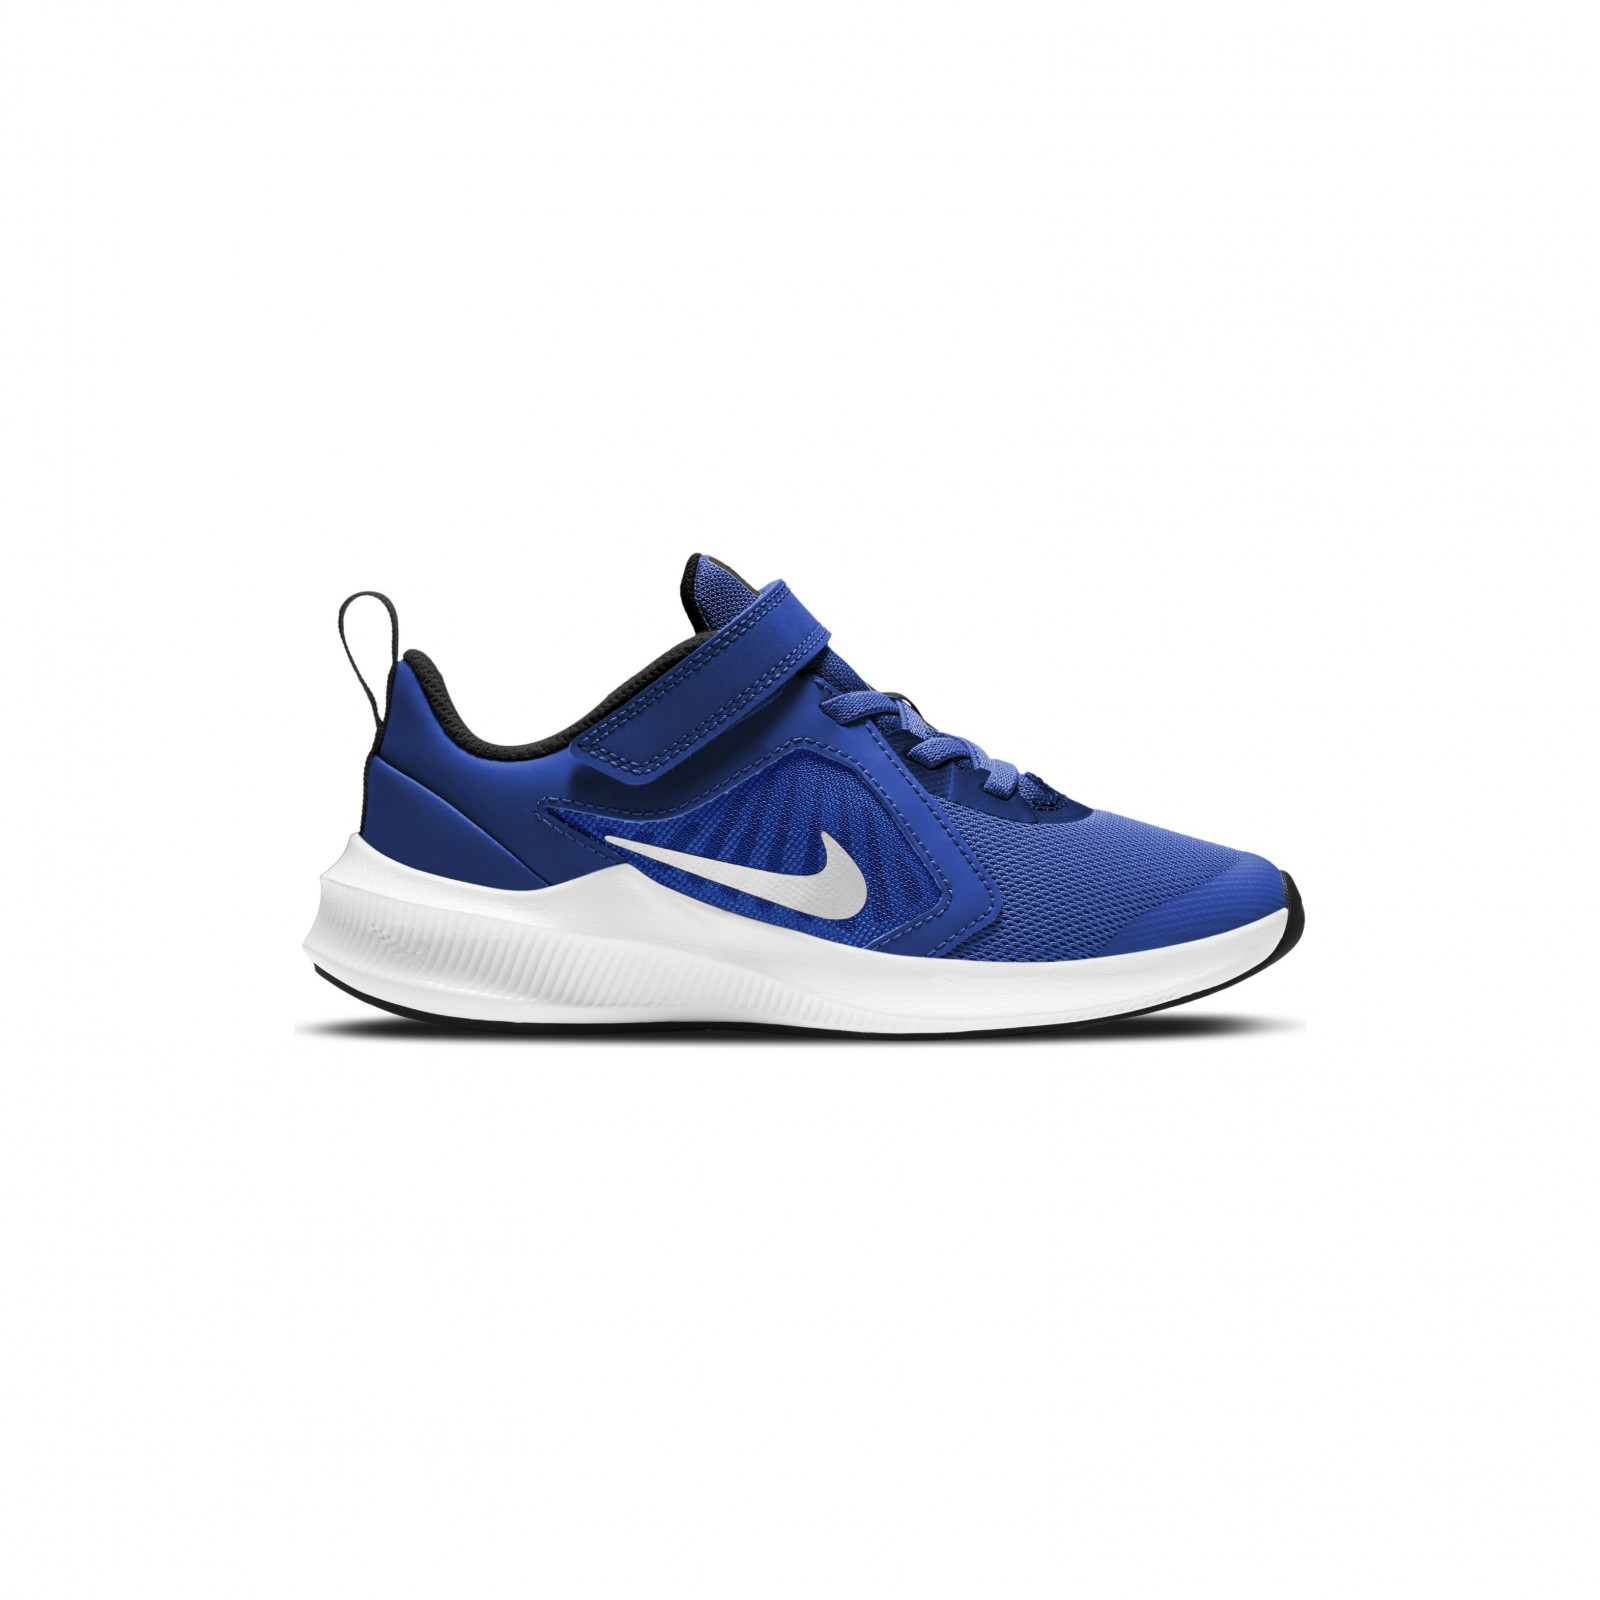 Nike Downshifter 10 GAME ROYAL/WHITE-BLACK